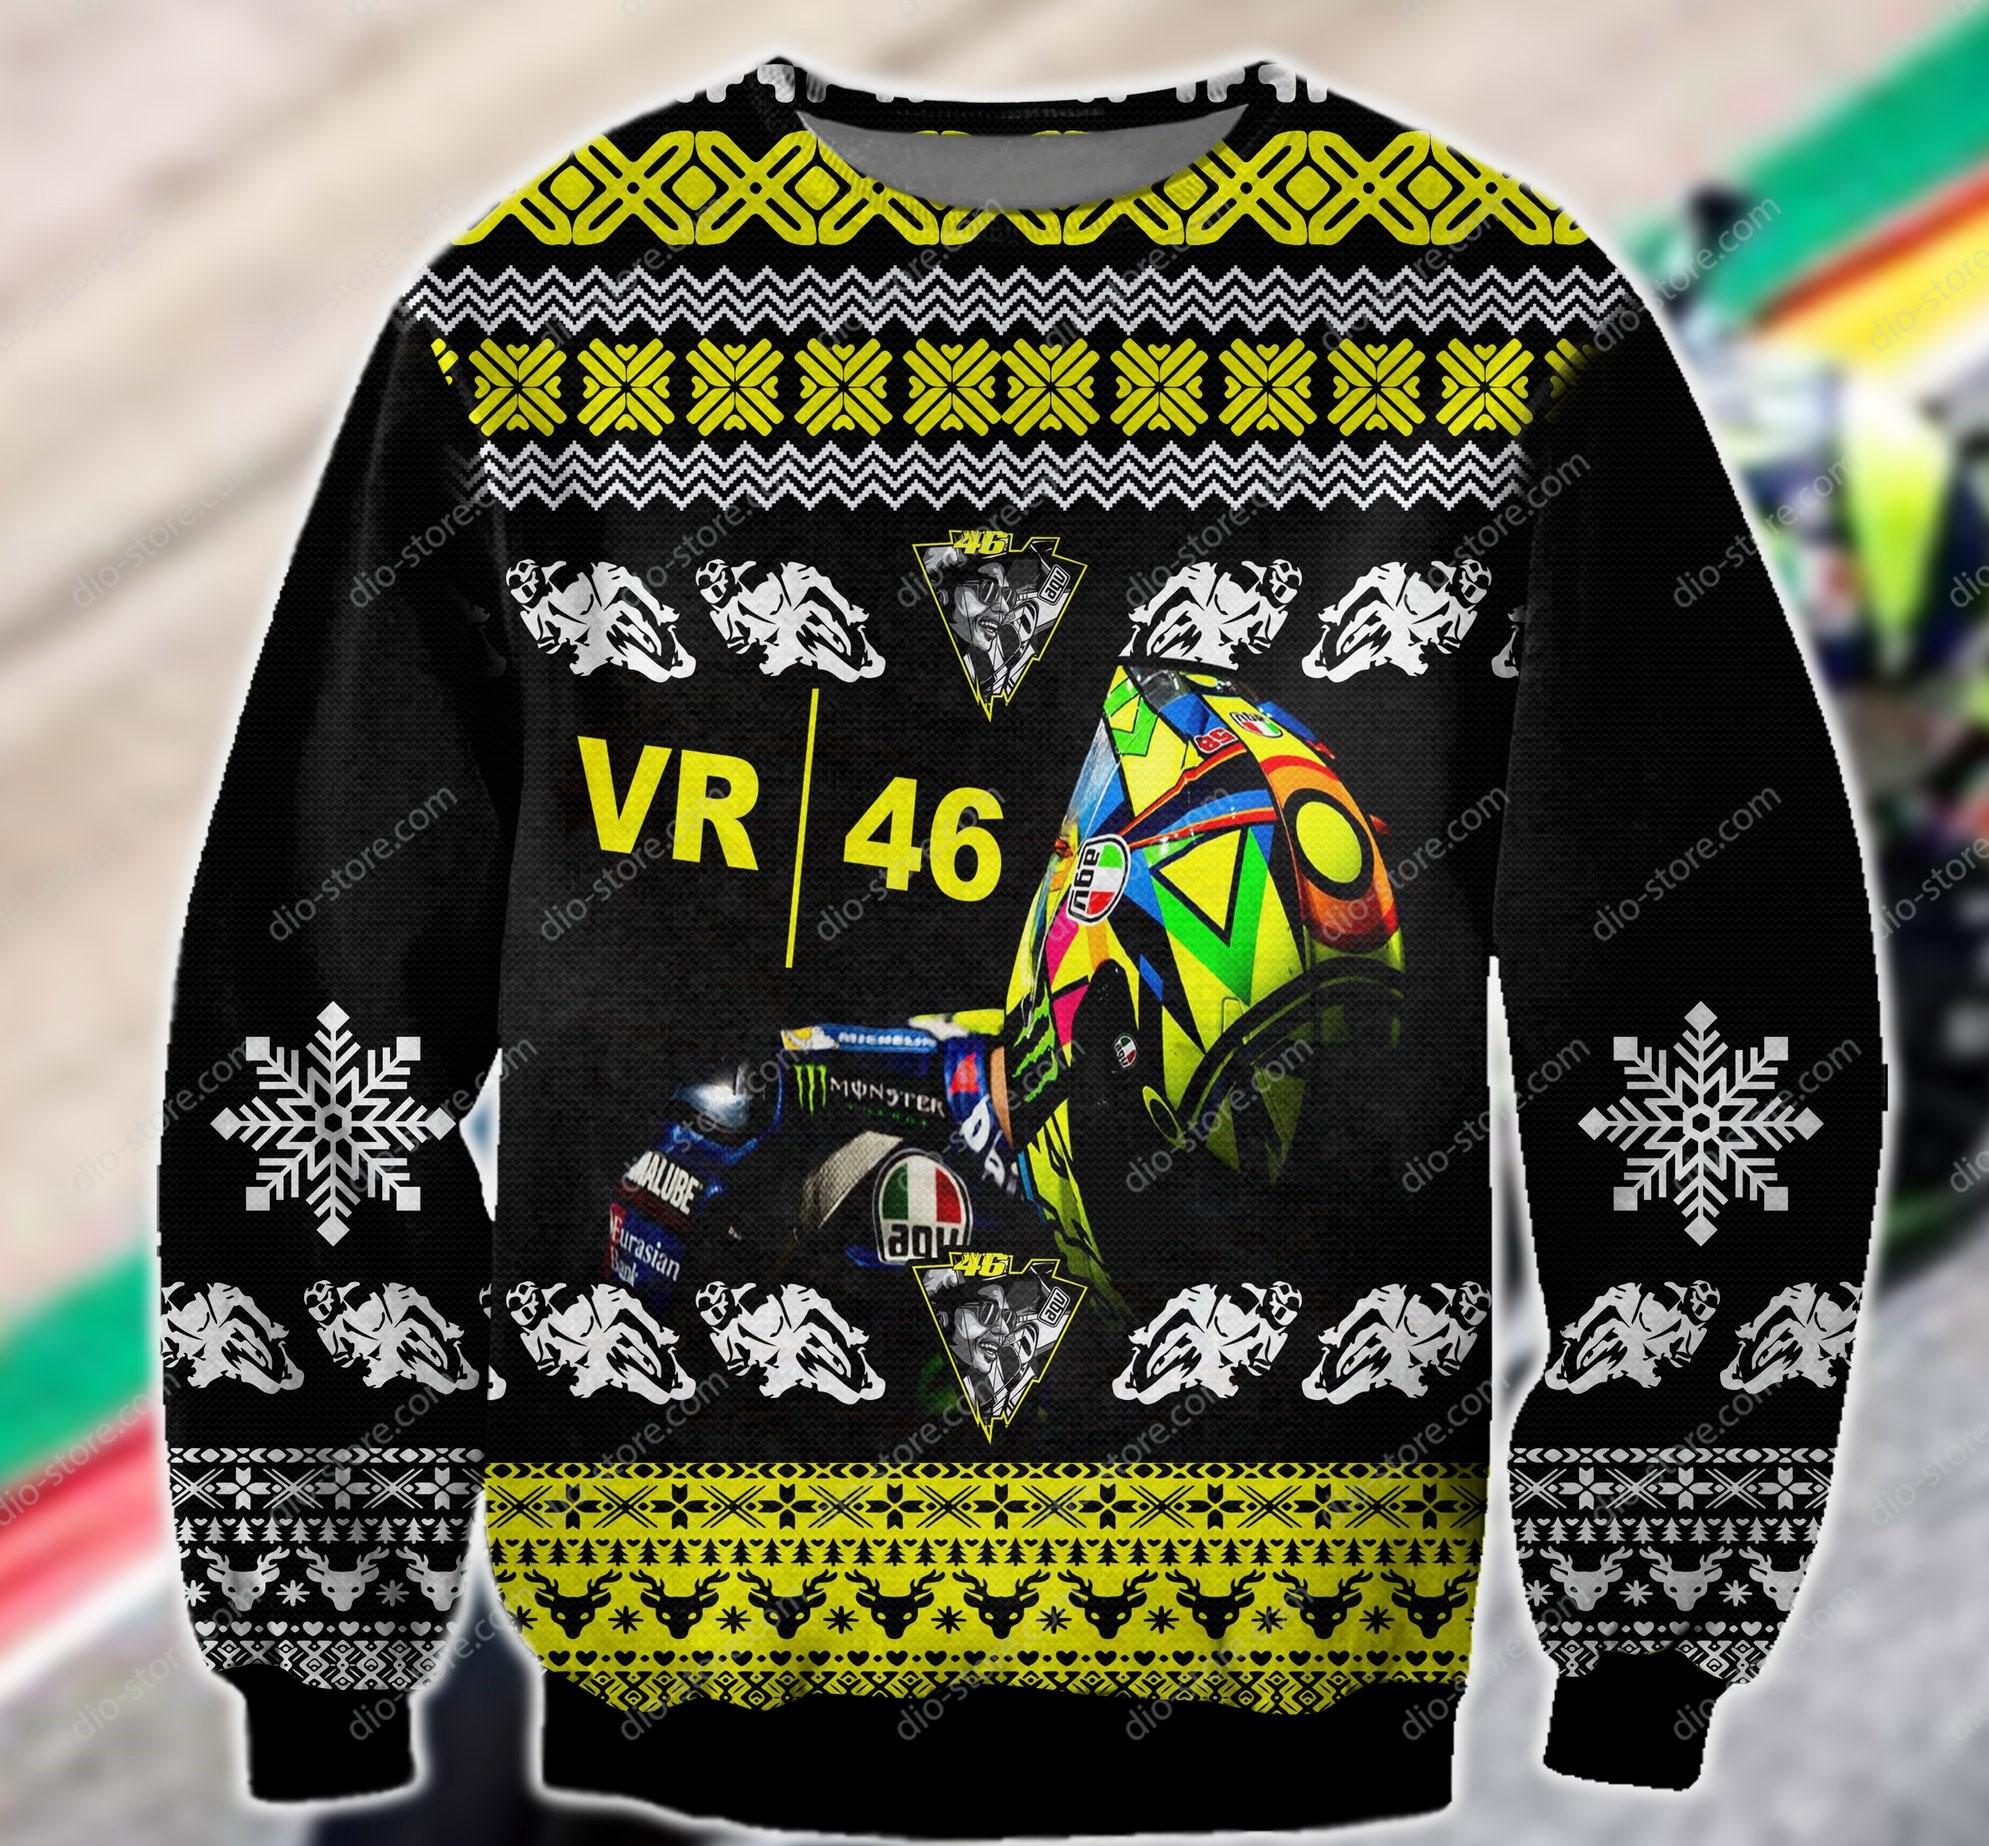 sky racing vr46 all over printed ugly christmas sweater 2 - Copy (2)